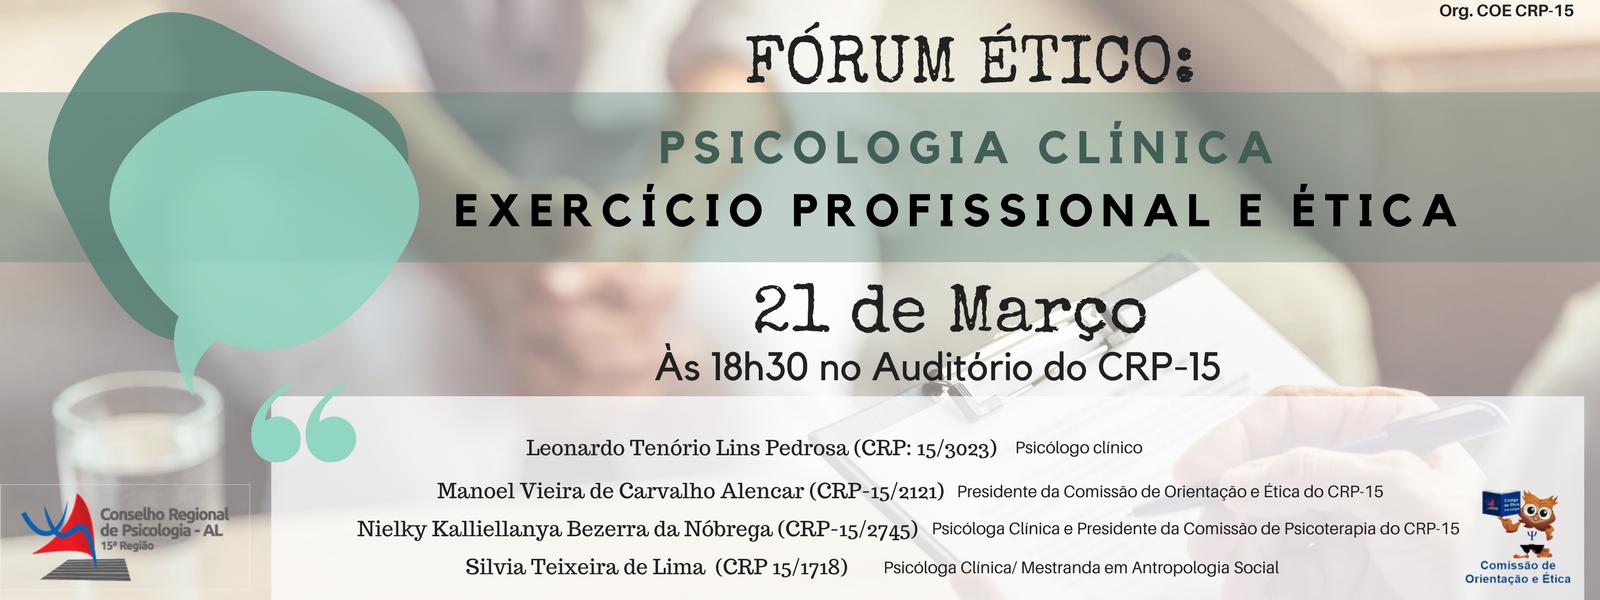 Fórum Ético: Psicologia Clínica